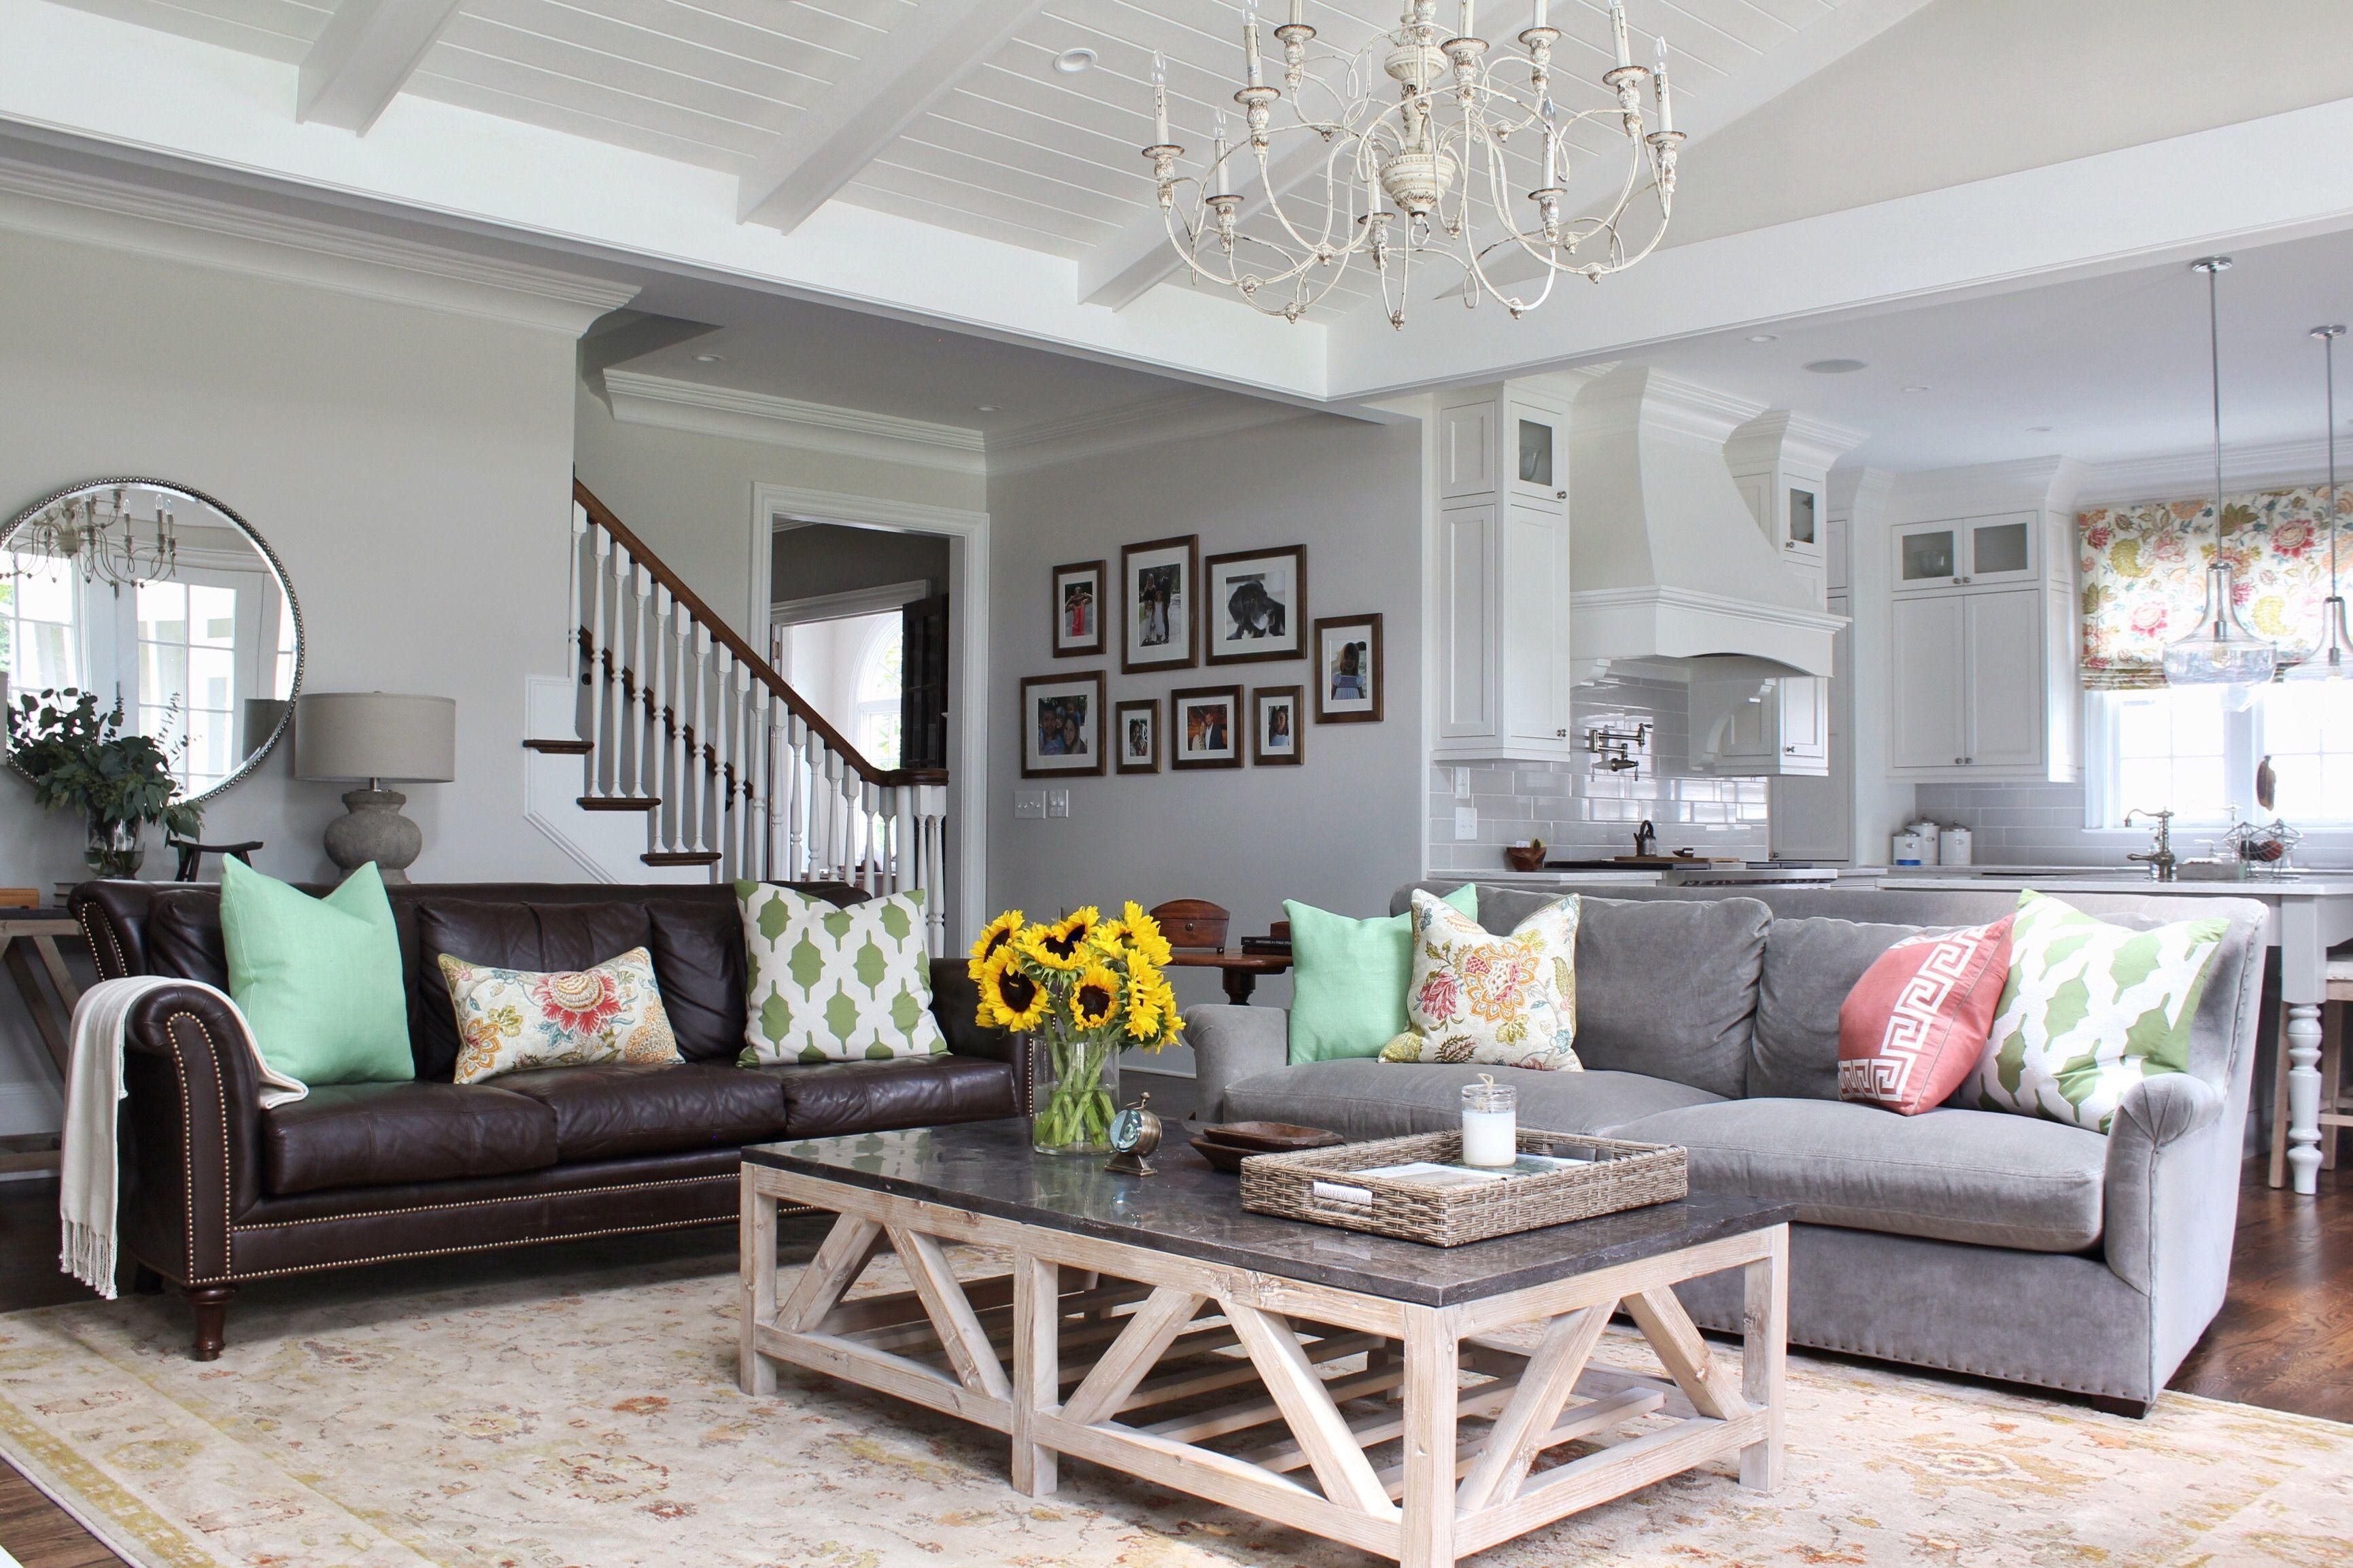 How Long Should House Sitters Leave A Client S Home Unattended Blue Label Bungalow Interior Design House Design Bungalow Living Rooms